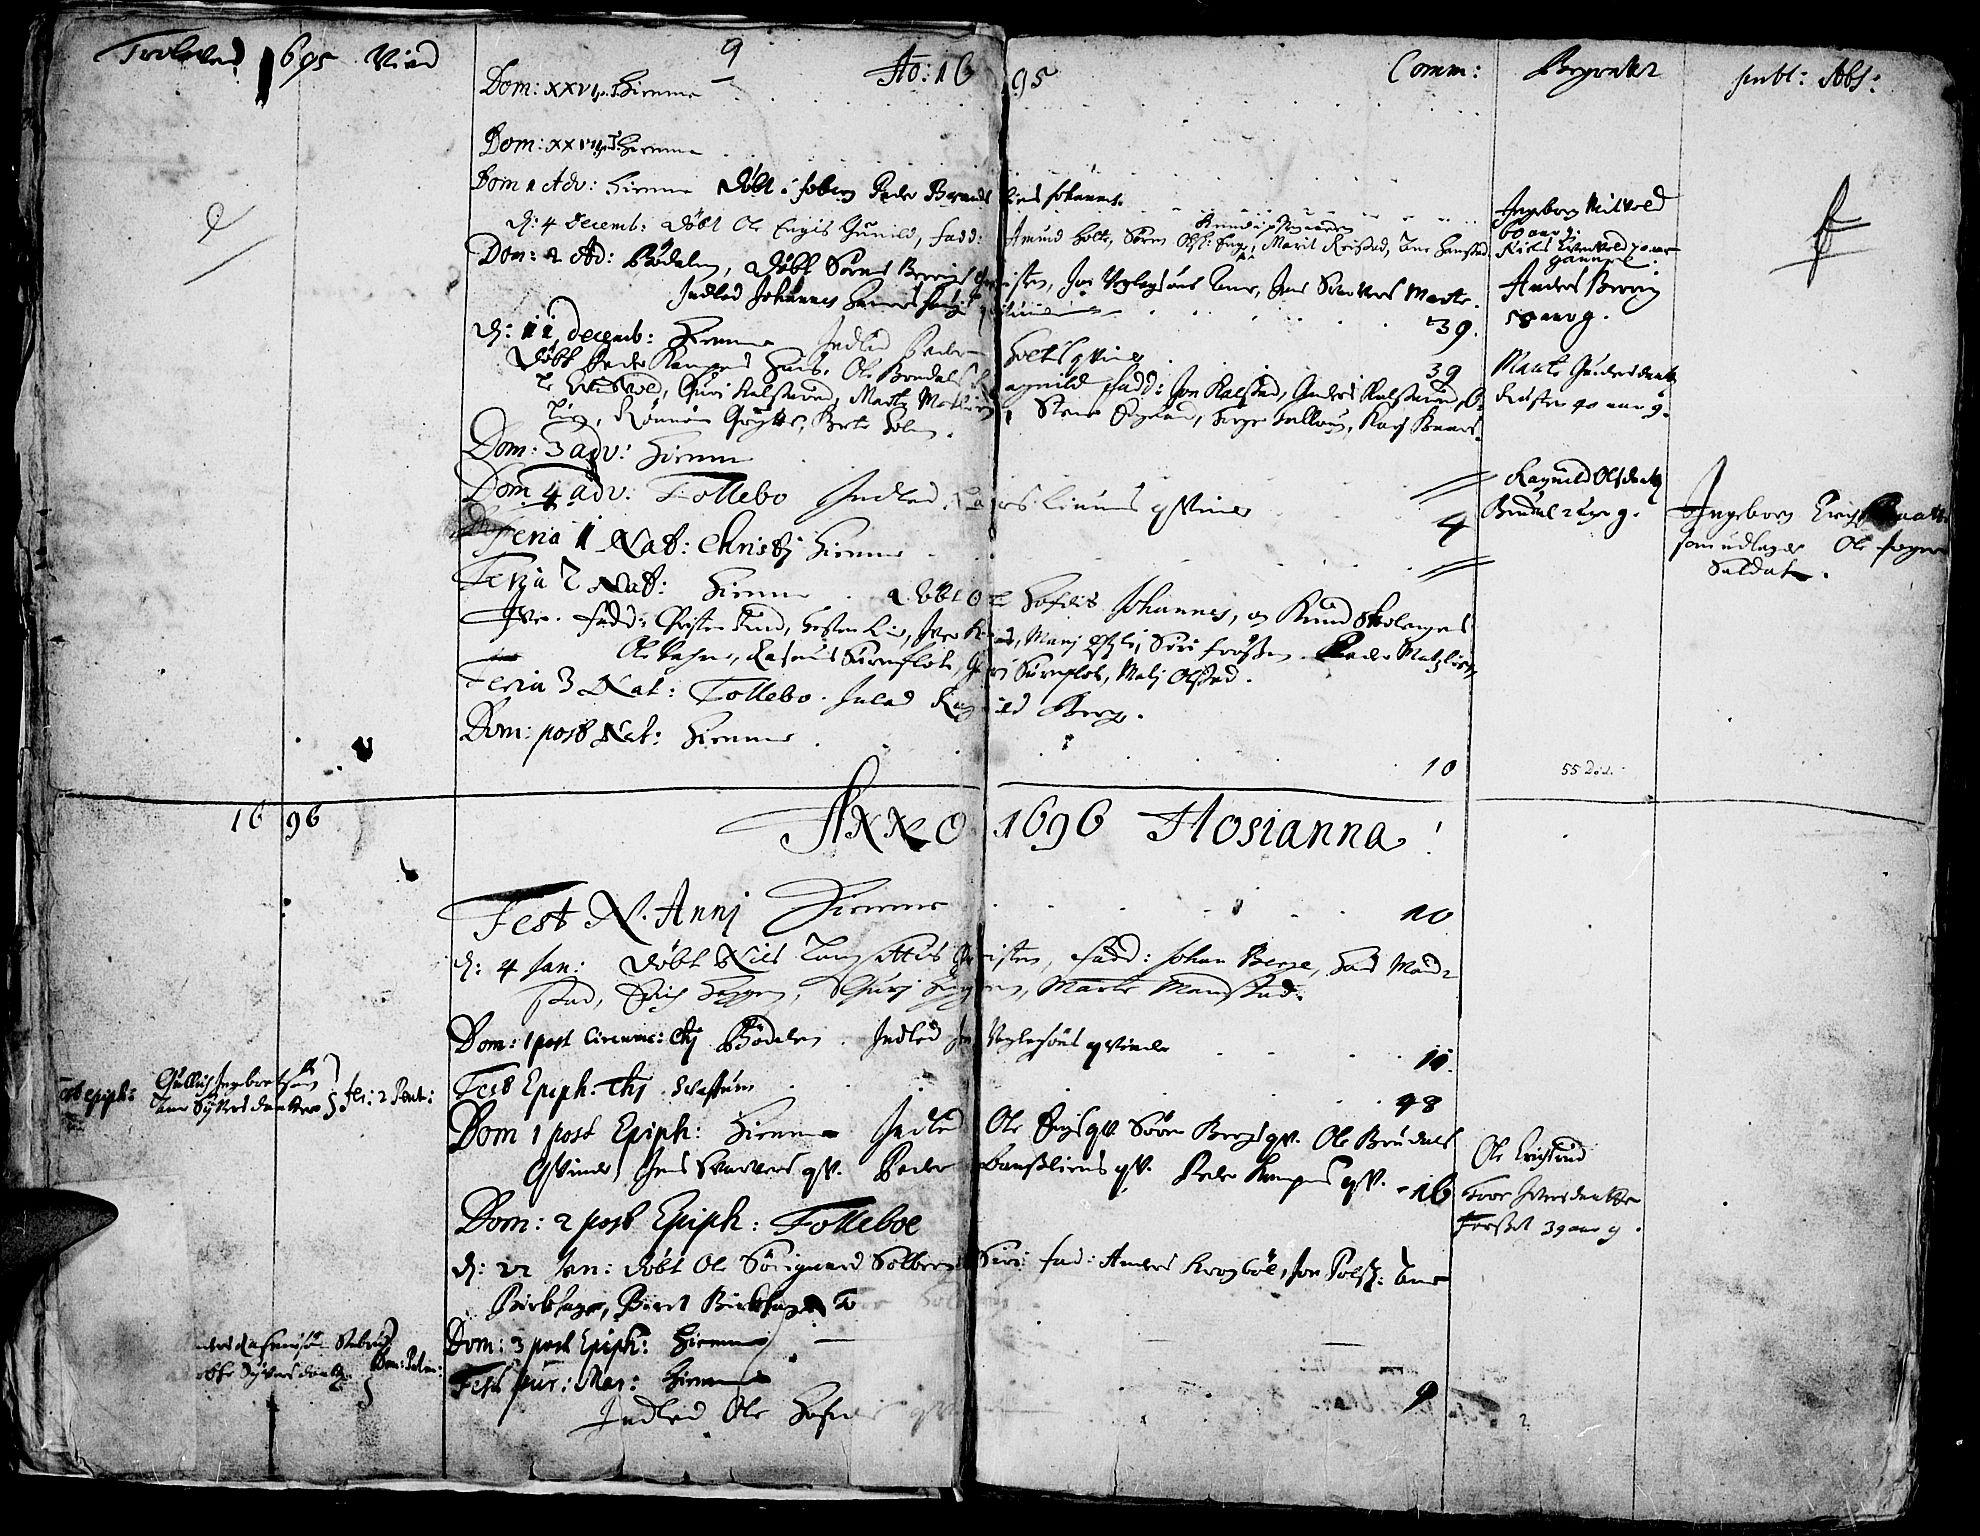 SAH, Gausdal prestekontor, Ministerialbok nr. 1, 1693-1728, s. 9